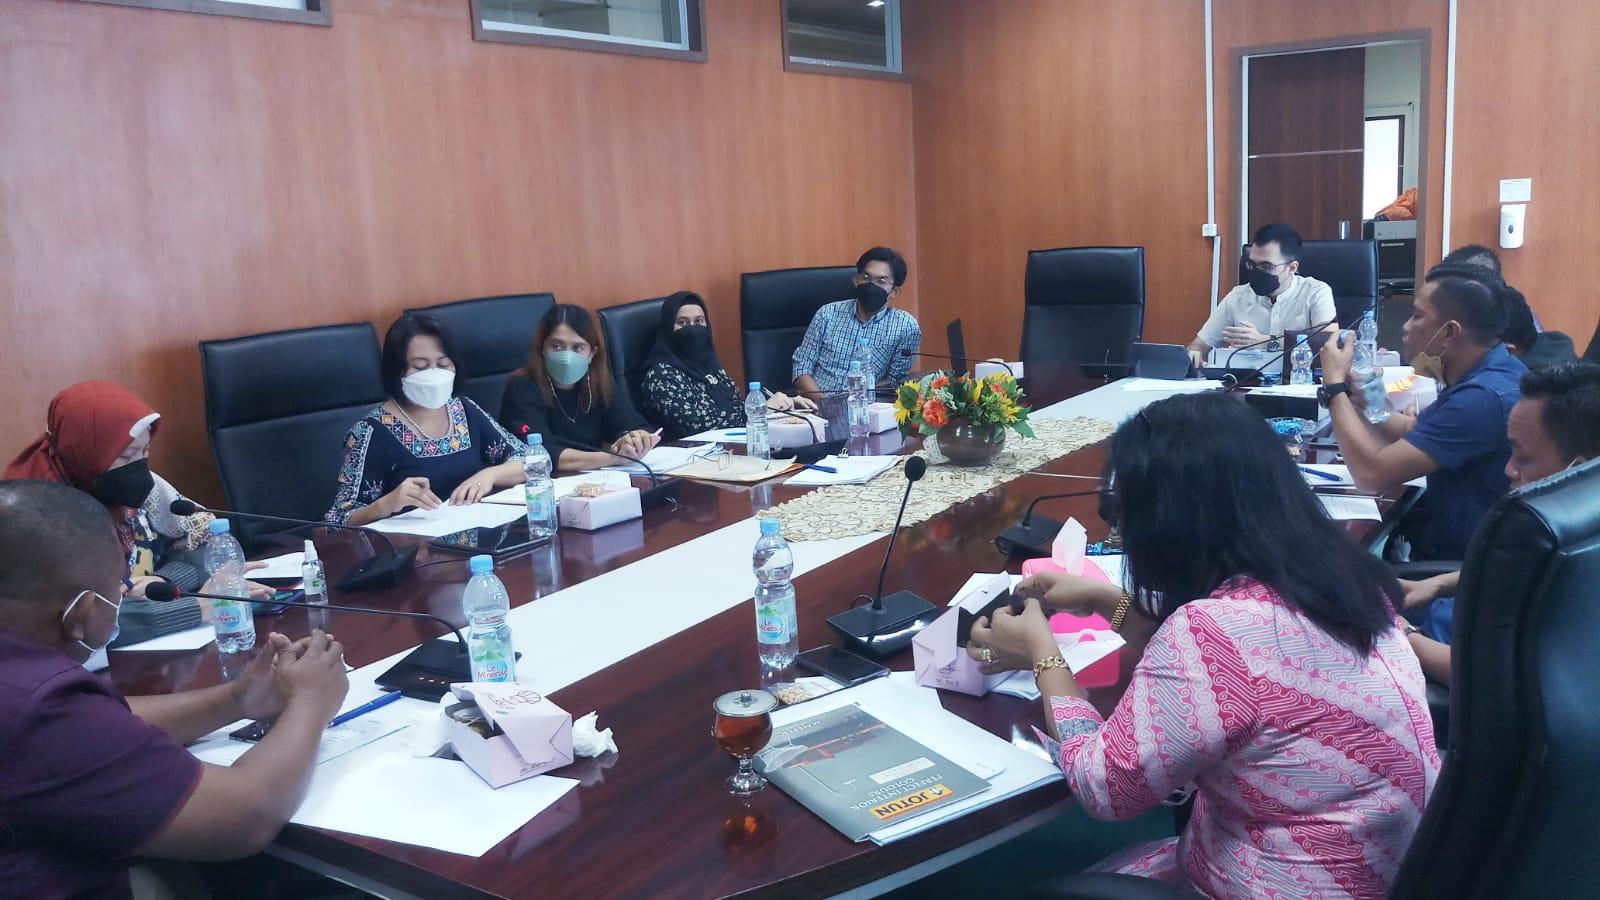 DPRD Medan Minta Dinas PMPTSP Permudah Izin Klinik Kesehatan